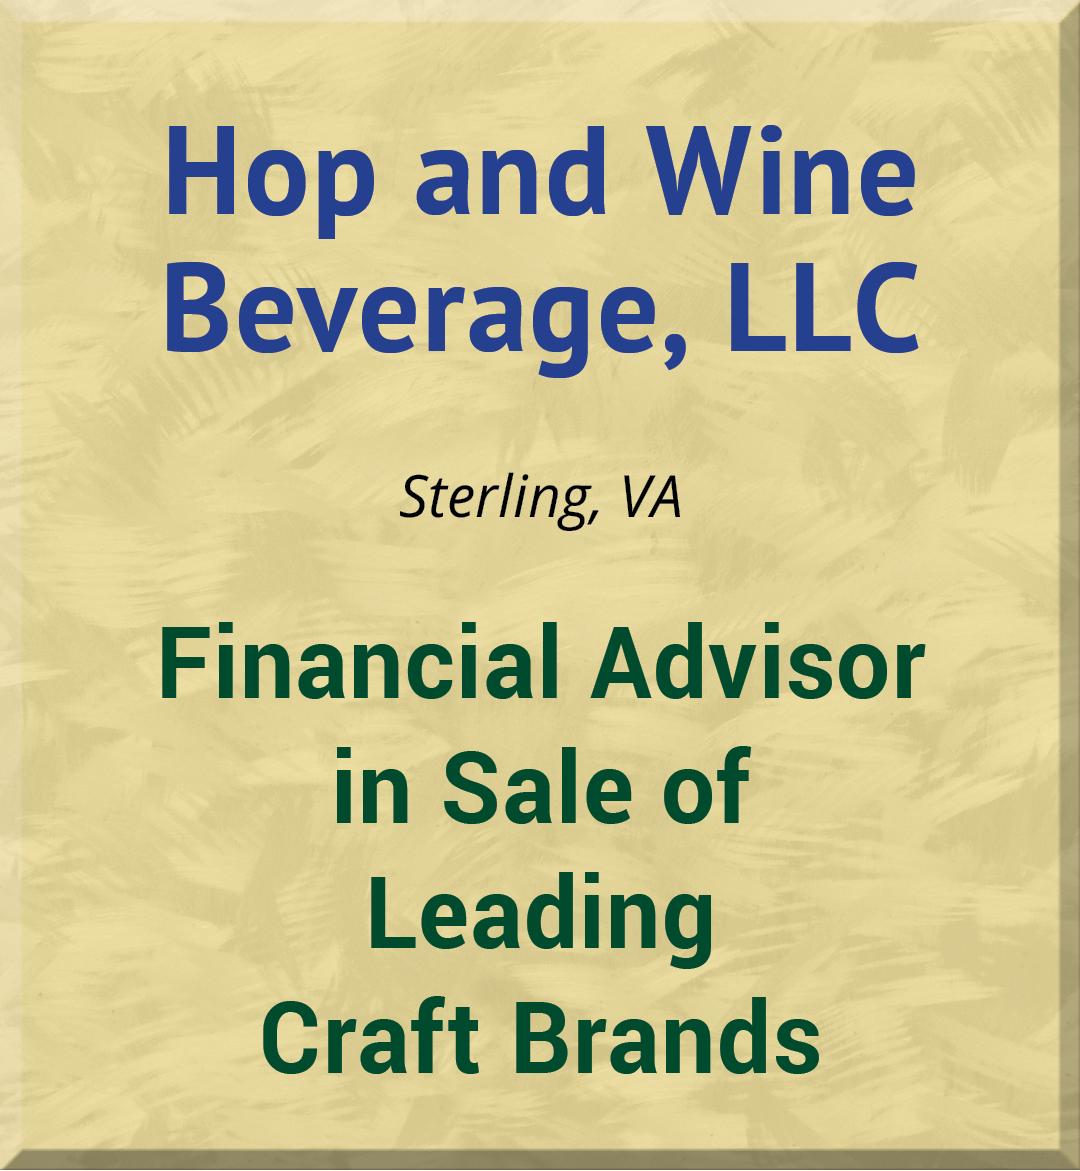 Hop and Wine Beverage, LLC